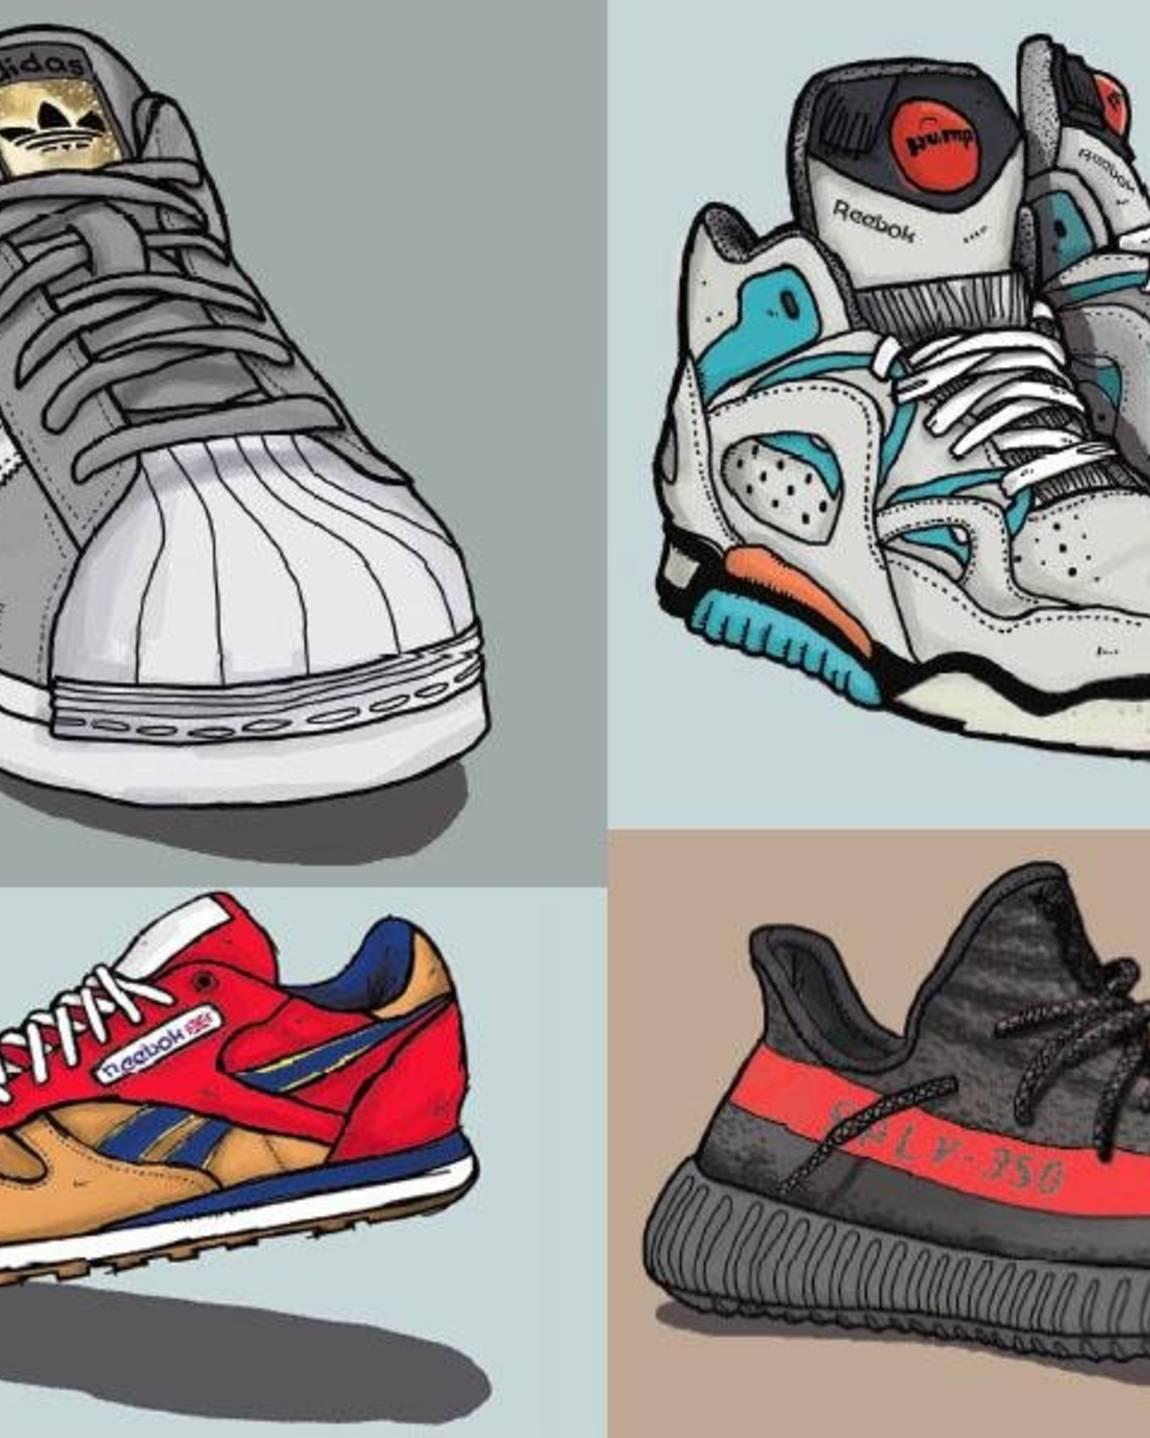 Sneakers ABC: Alles, was du über Sneakers wissen musst!